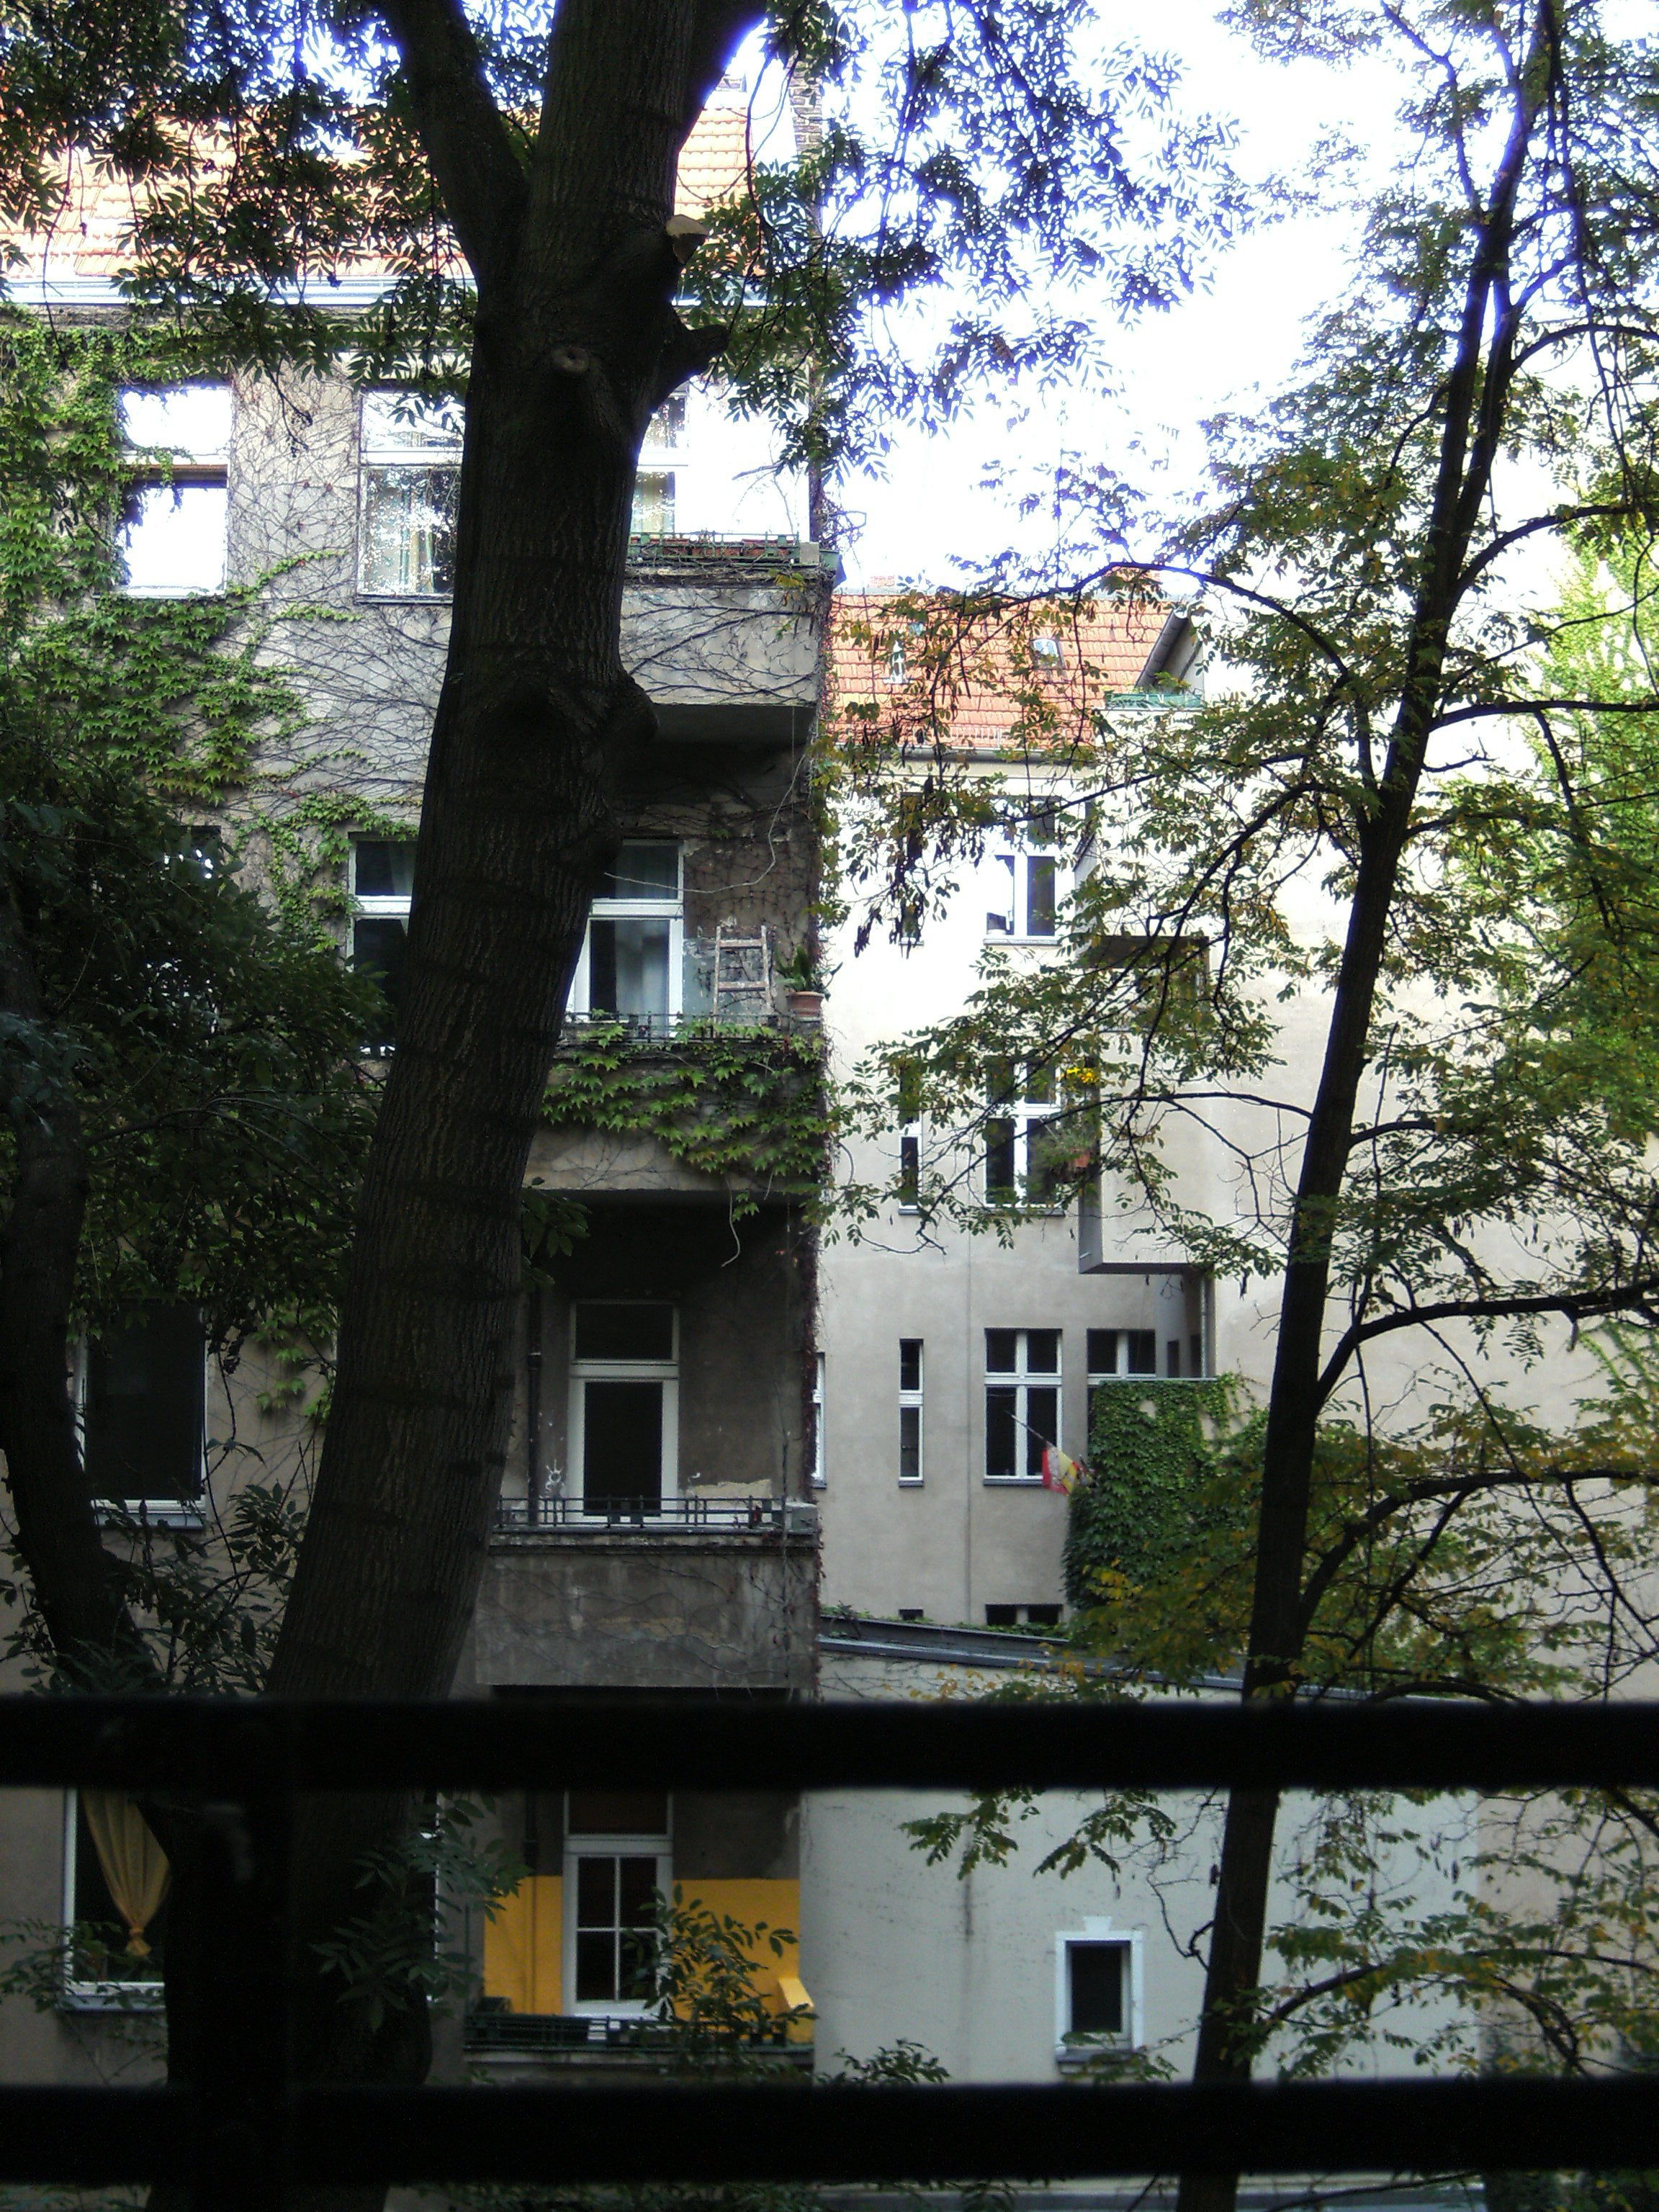 Baum_im_Hinterhofgedreht